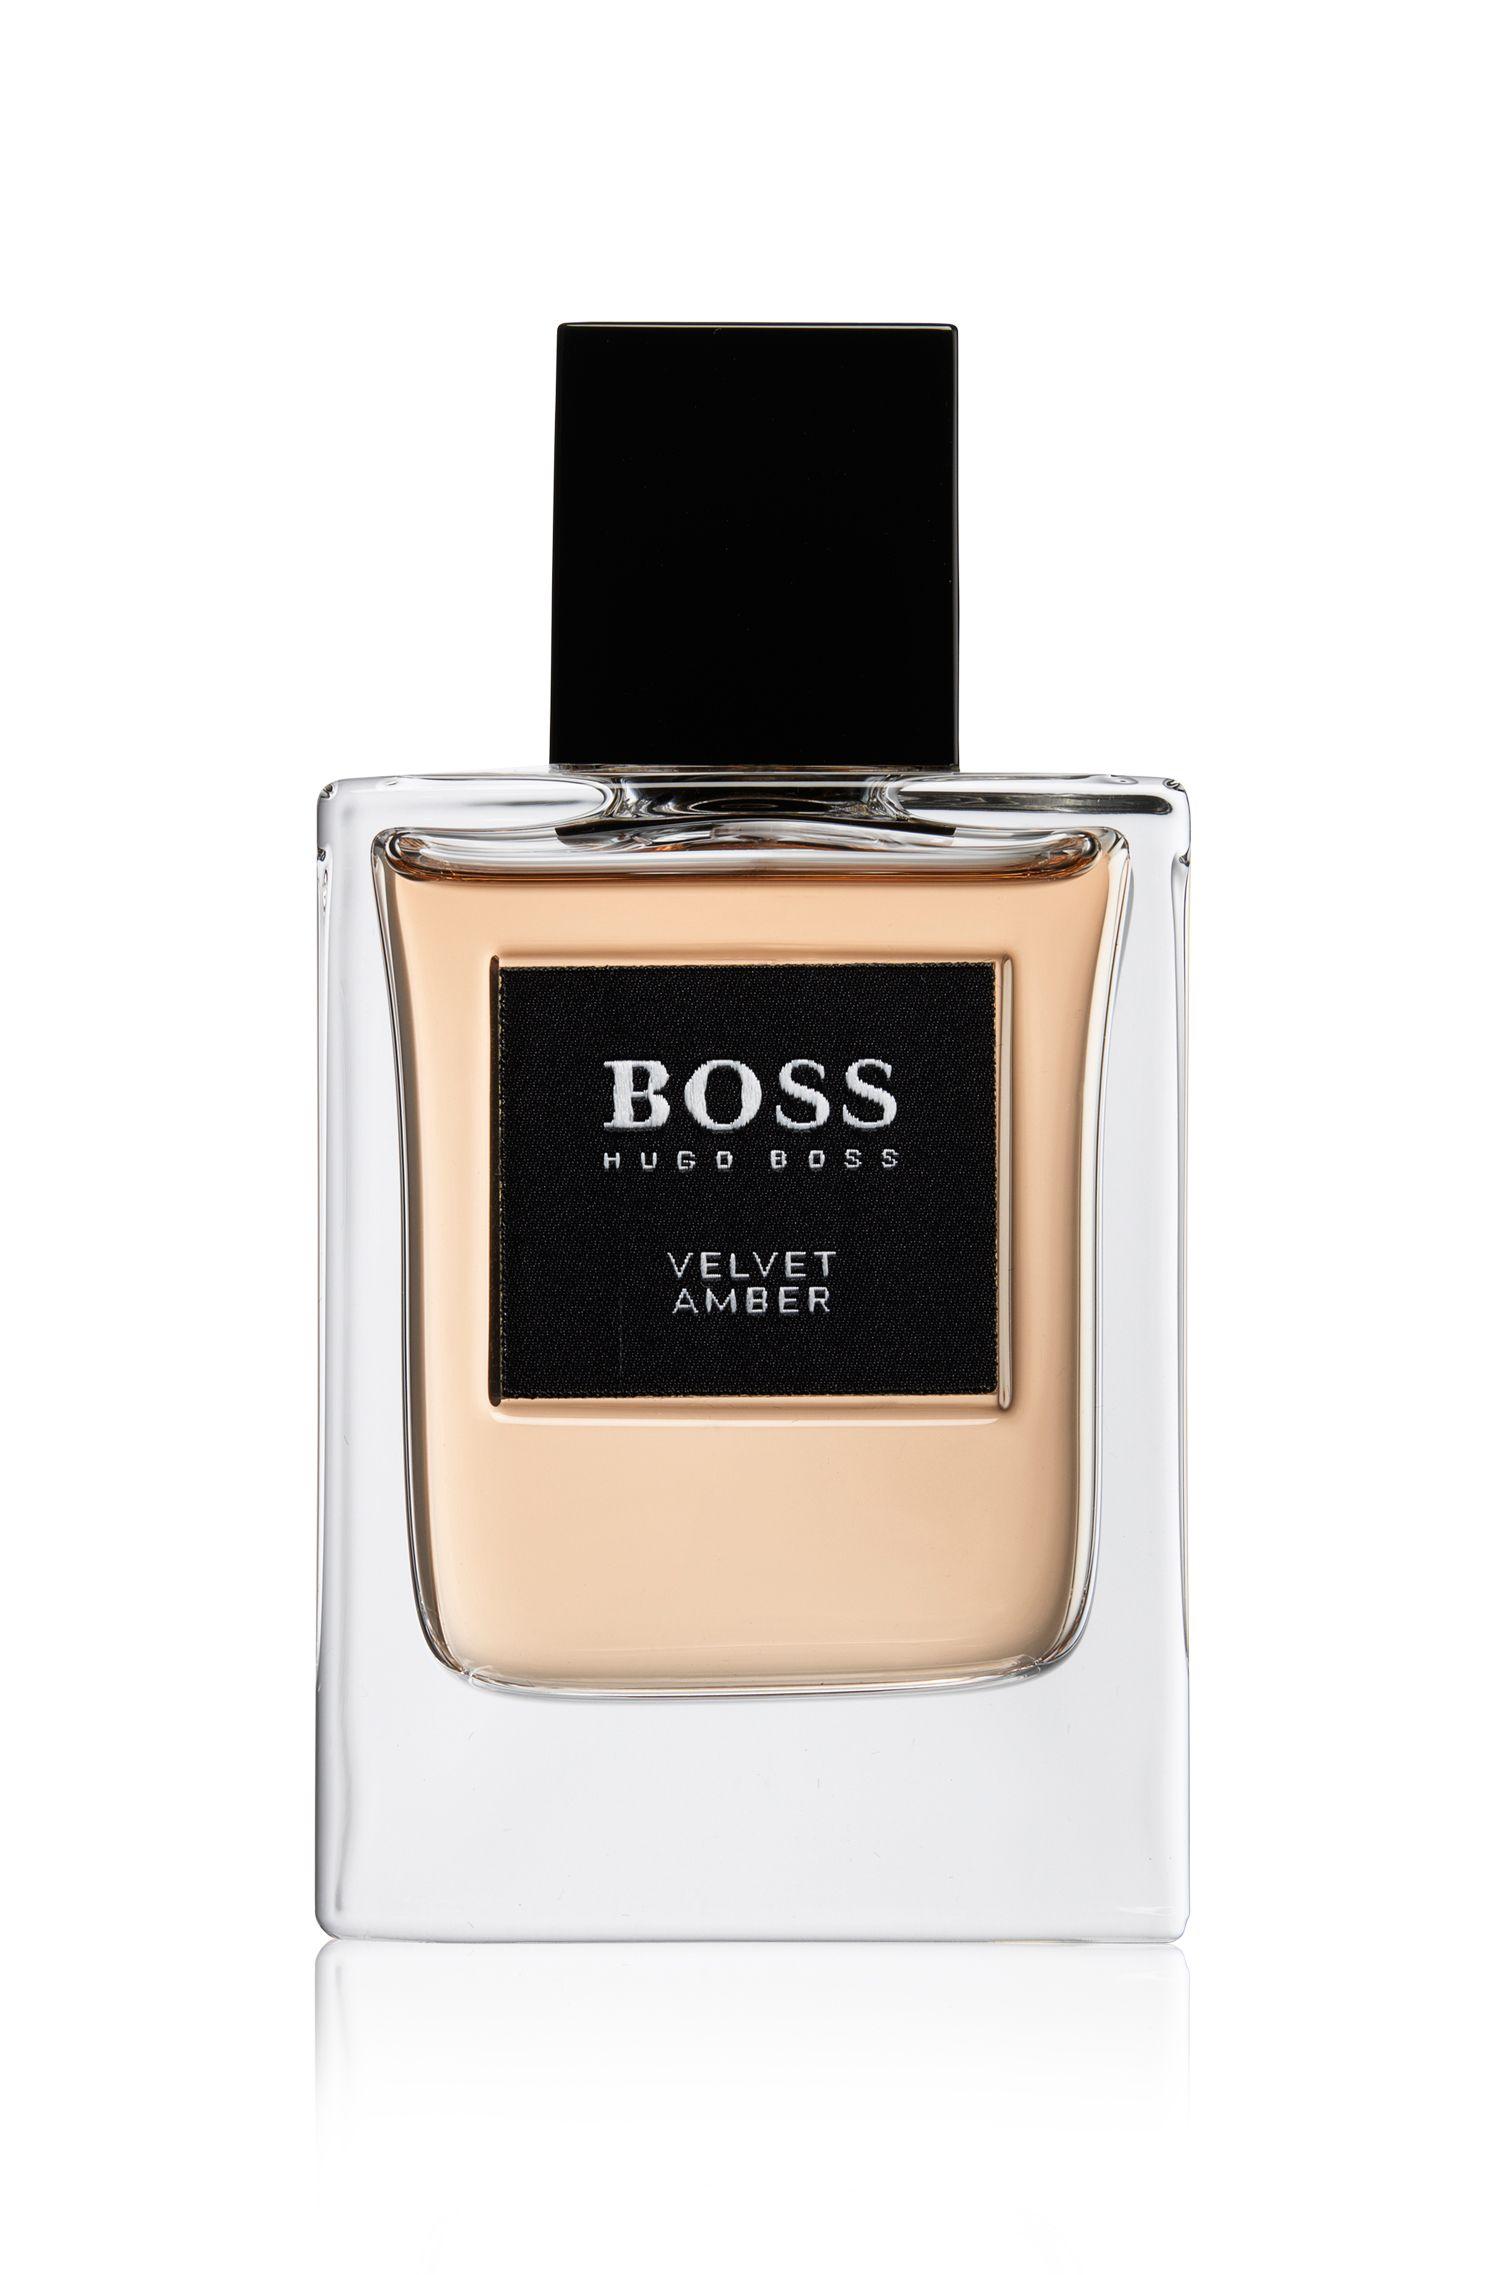 'BOSS The Collection' | 1.7 fl. oz. (50 mL) Velvet Amber Eau de Toilette,